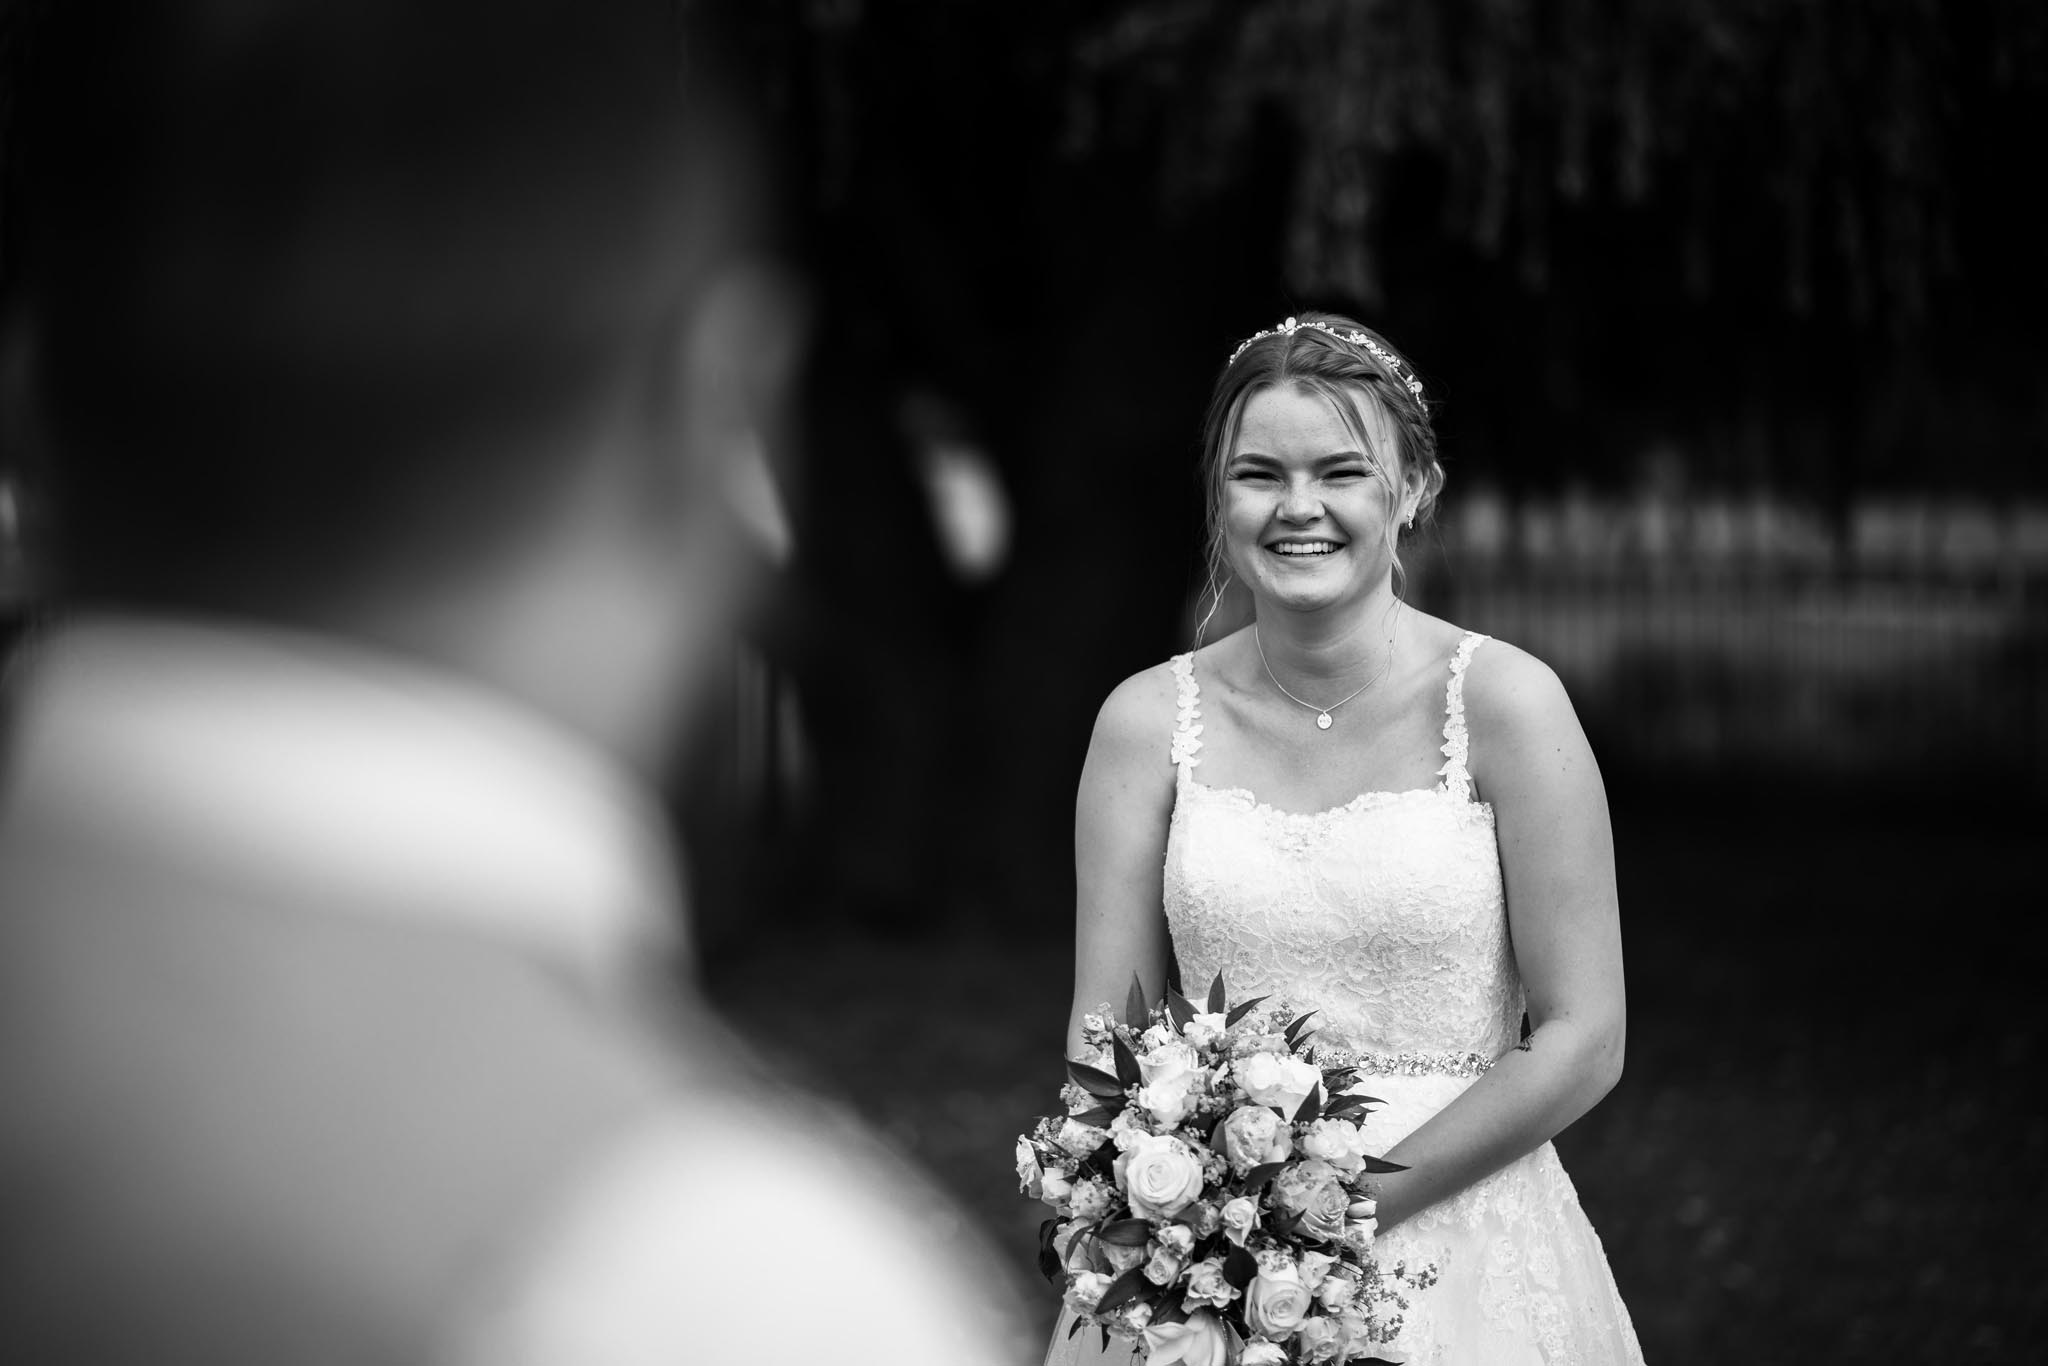 551-Bride-groom-Luke-Yasmin-The-Rayleigh-Club-Wedding-Photography.jpg